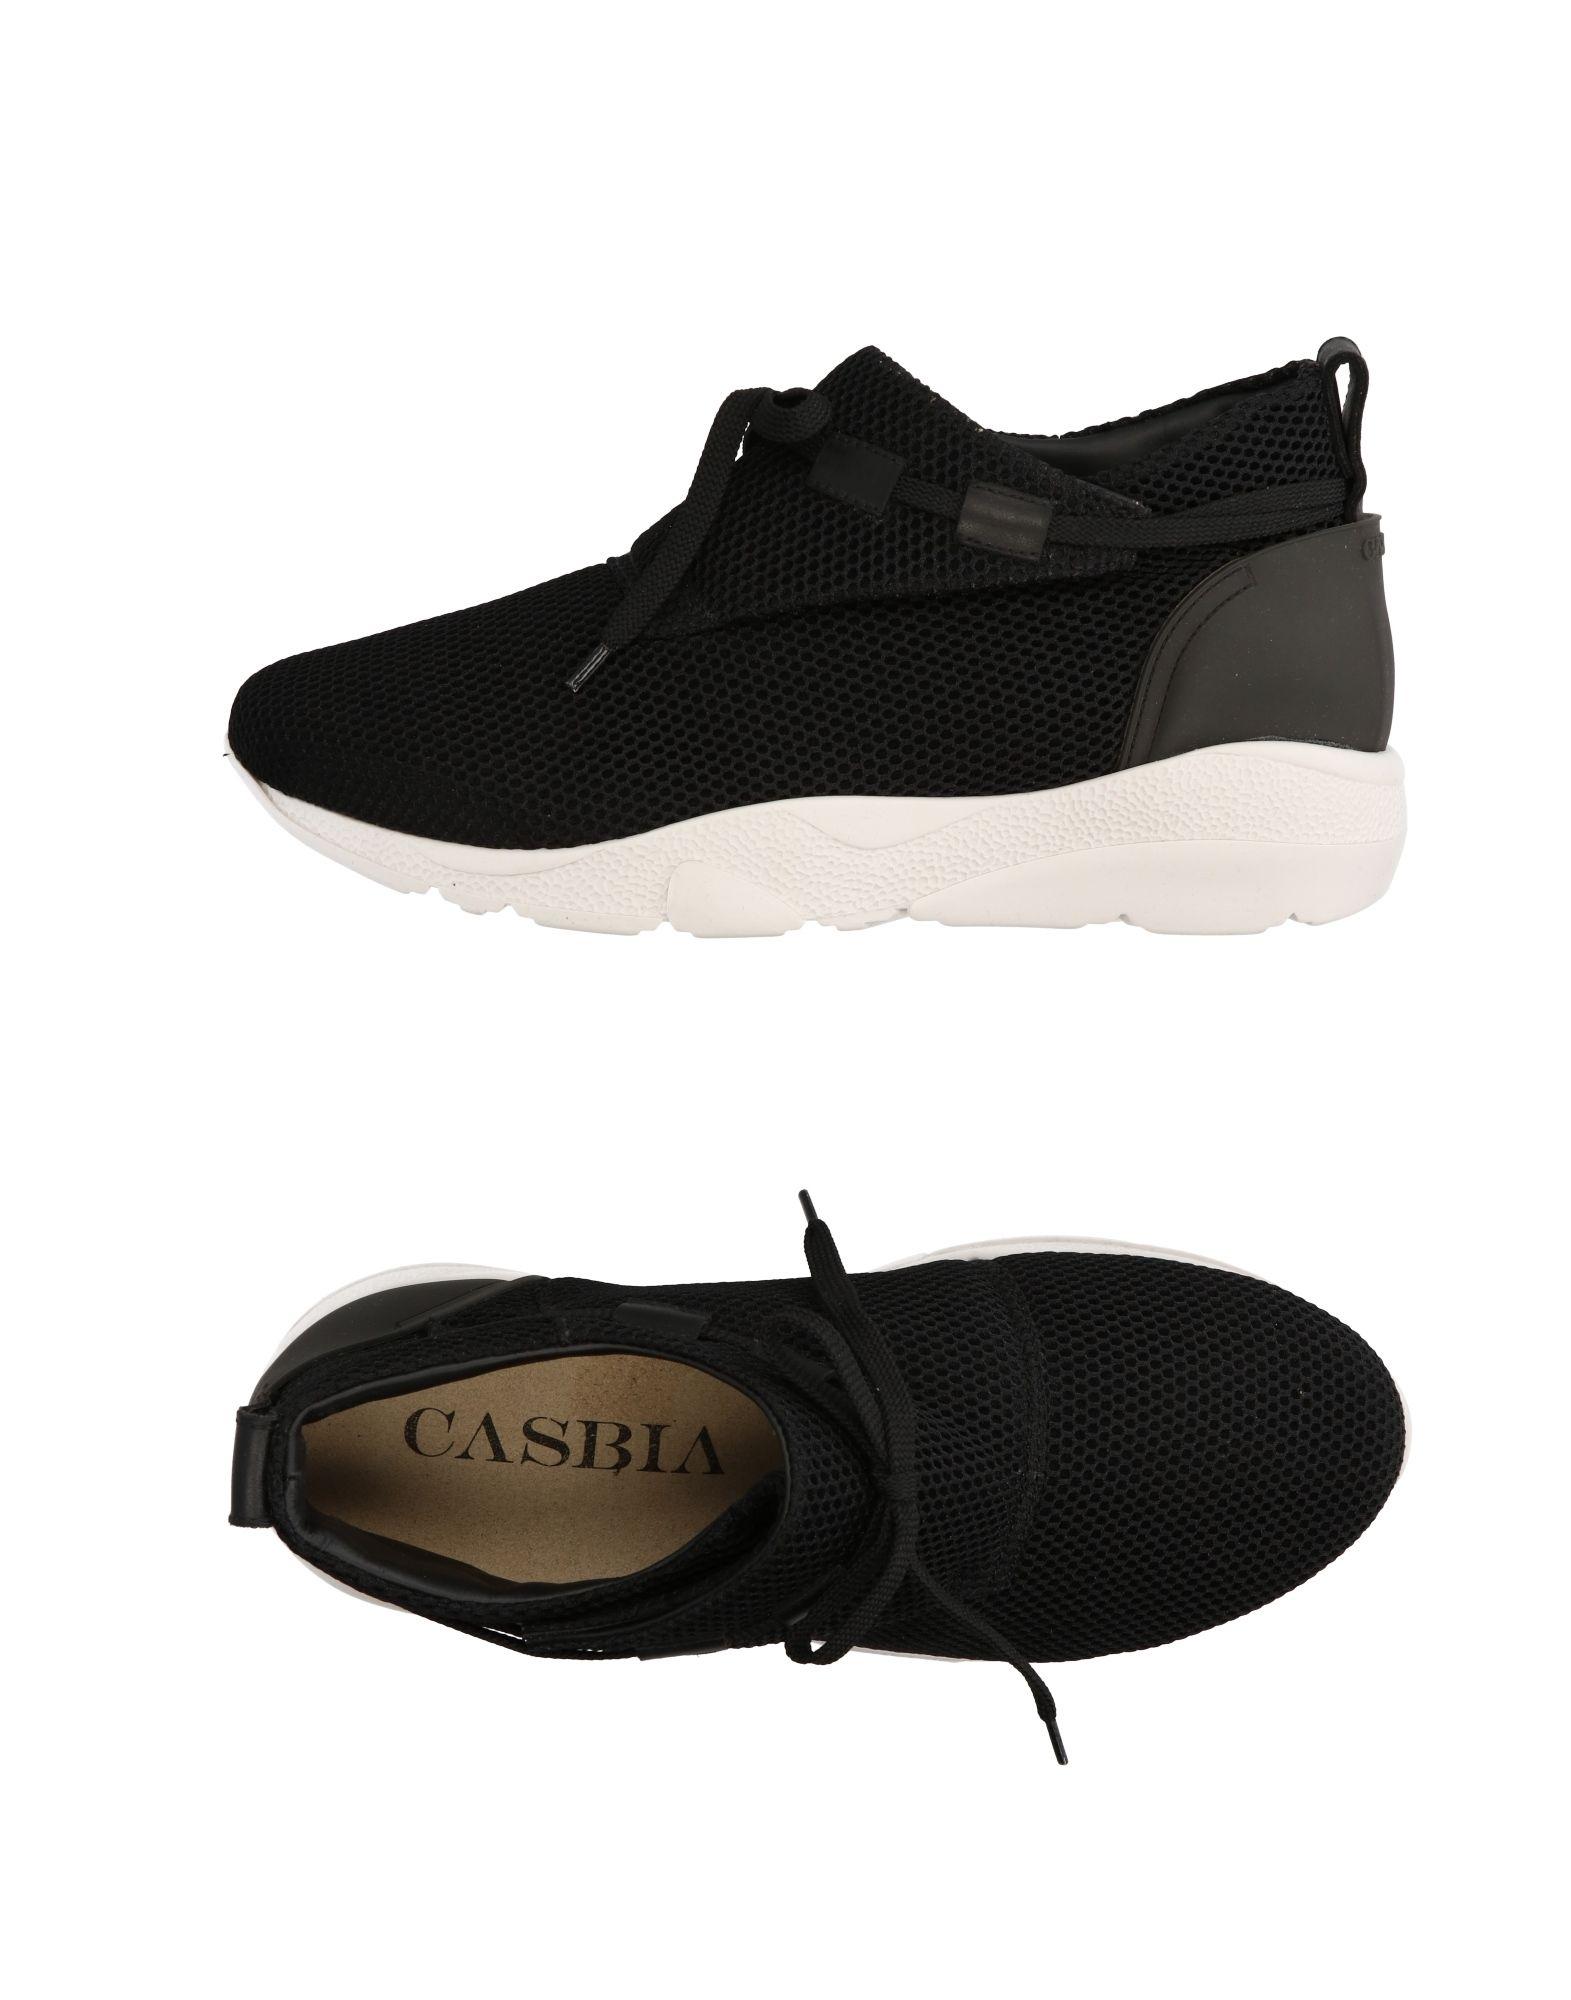 Casbia Sneakers Herren  11261237QN Heiße Schuhe Schuhe Schuhe 3d3f93